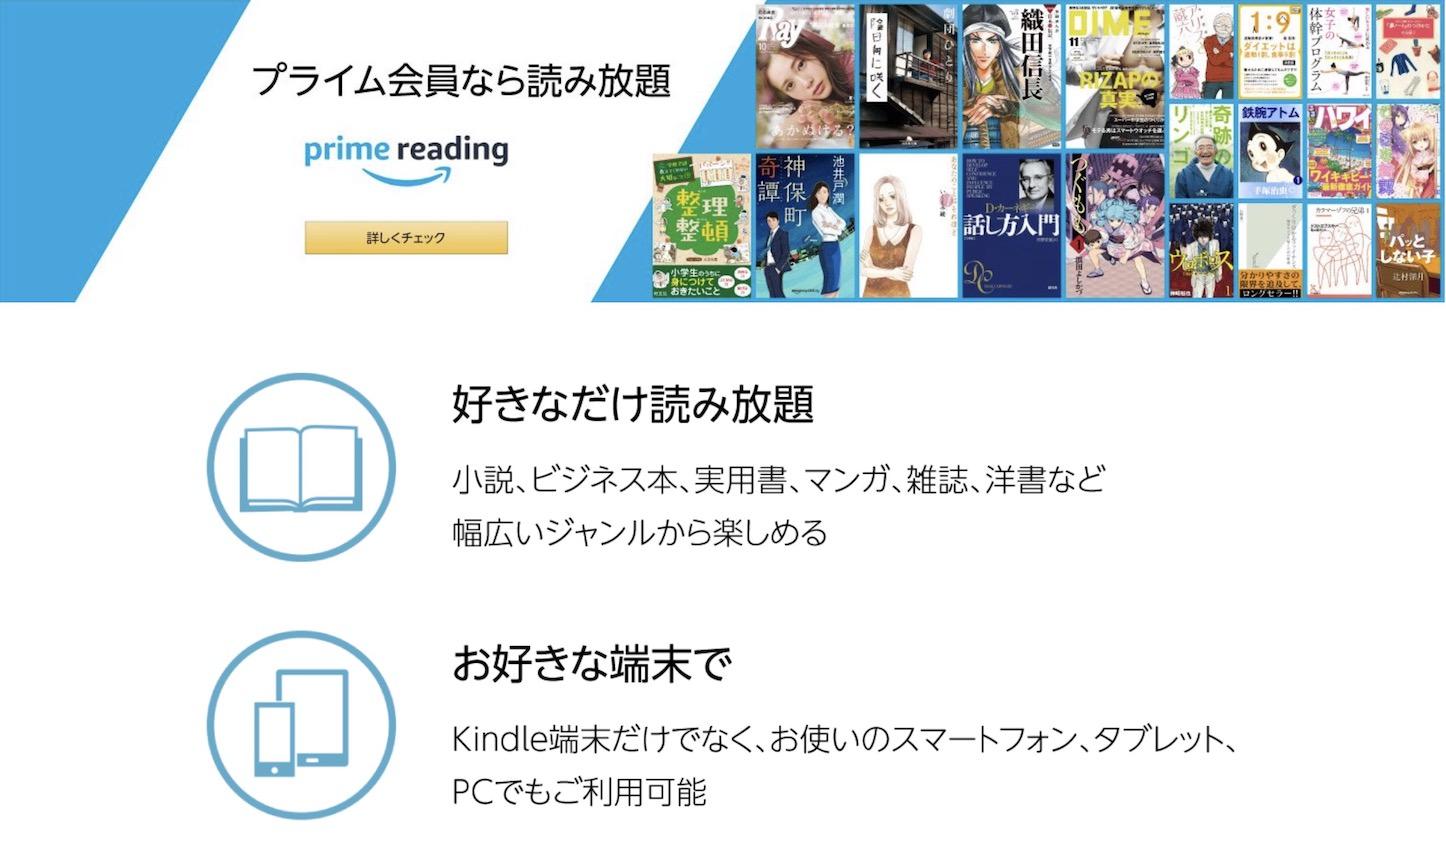 Prime-Reading.jpg